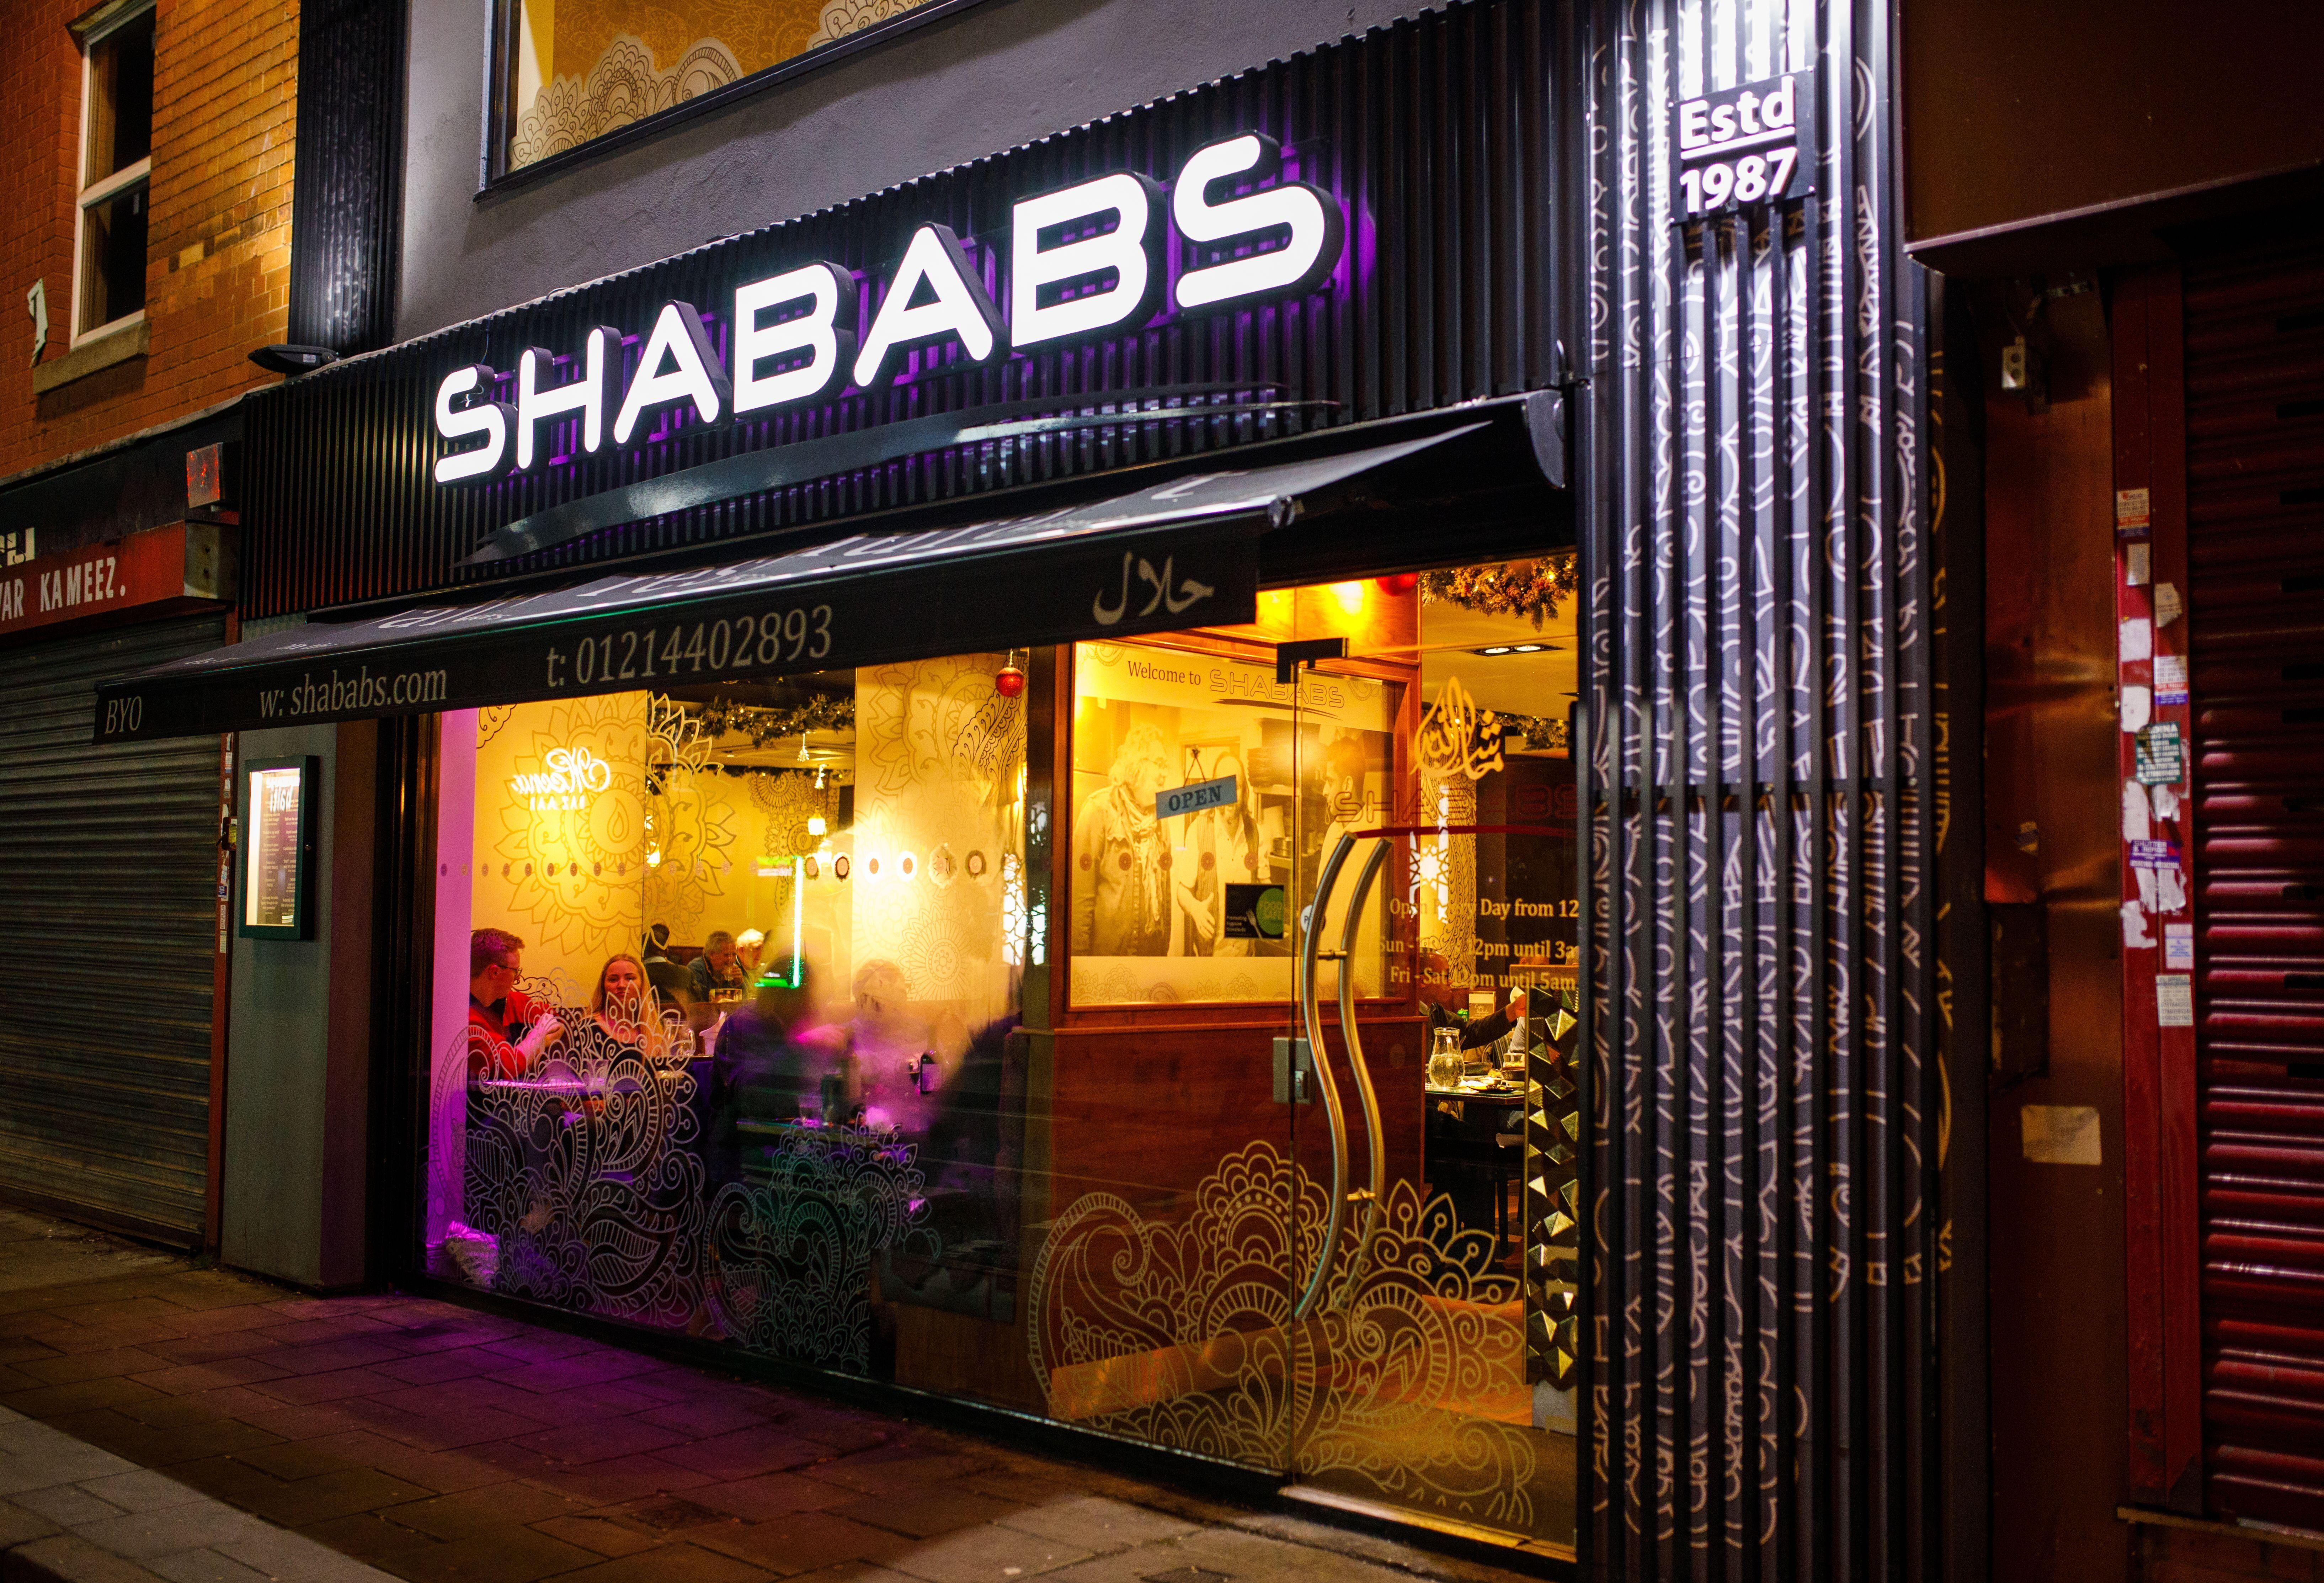 Shabab's restaurant on Ladypool Road